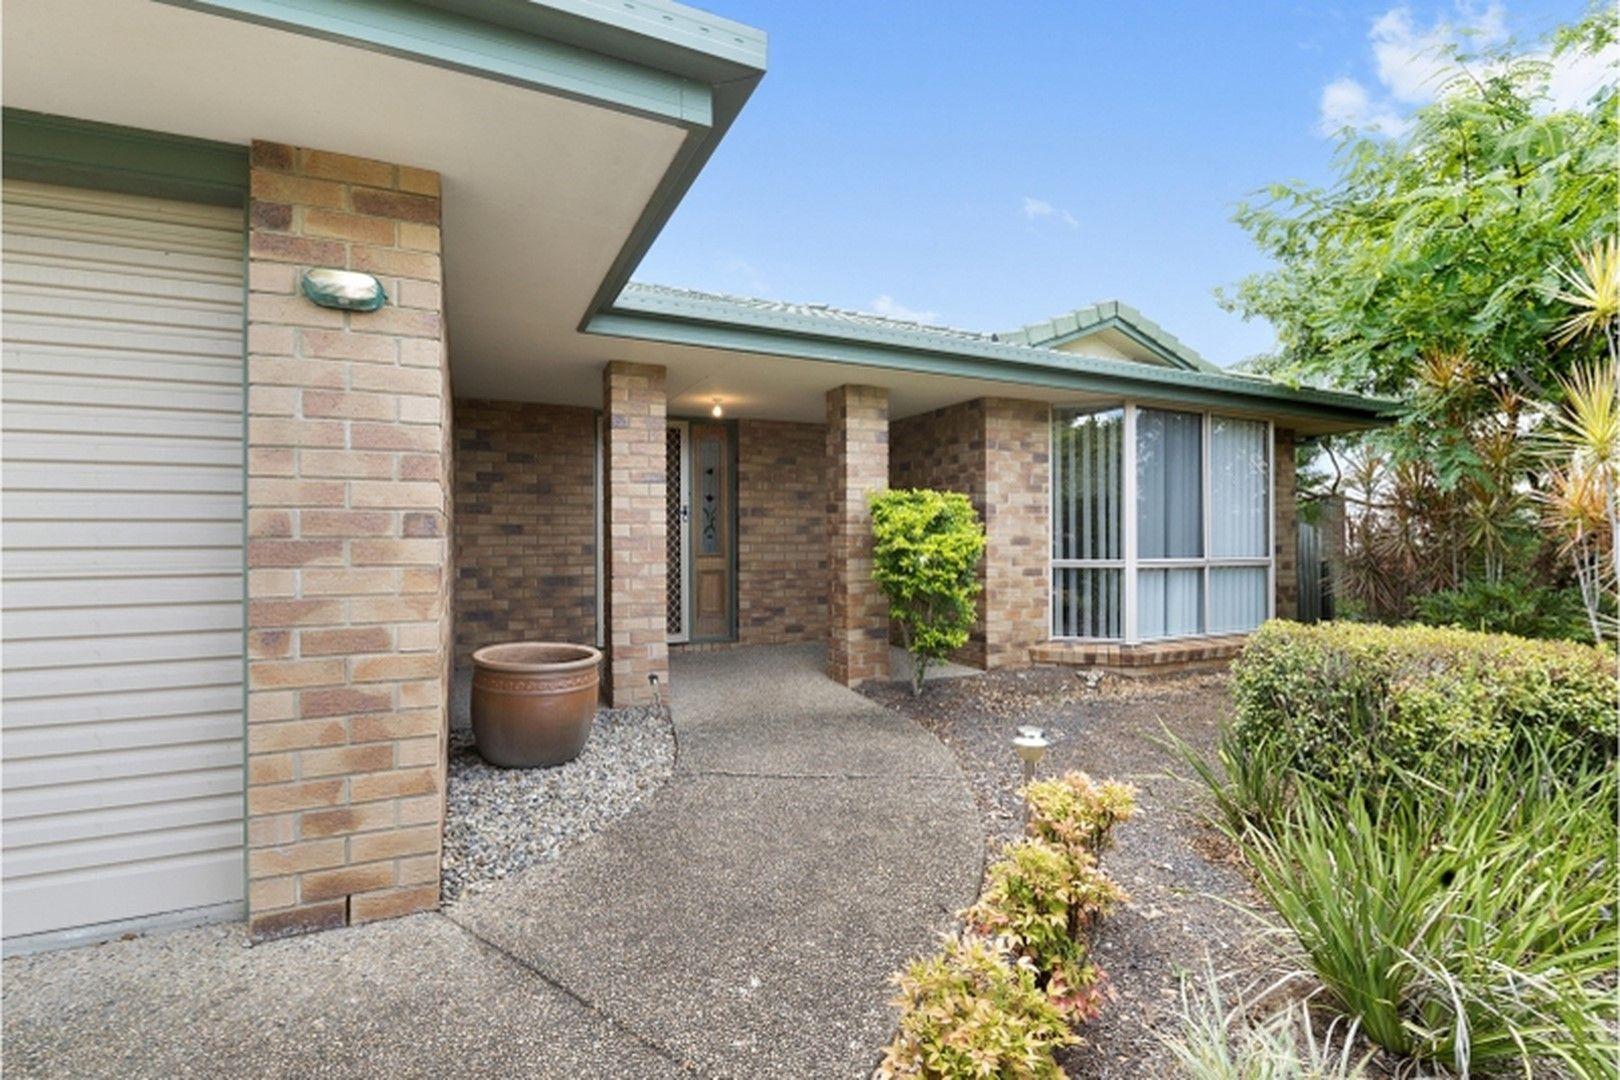 6 Bettina Court, Eatons Hill QLD 4037, Image 0